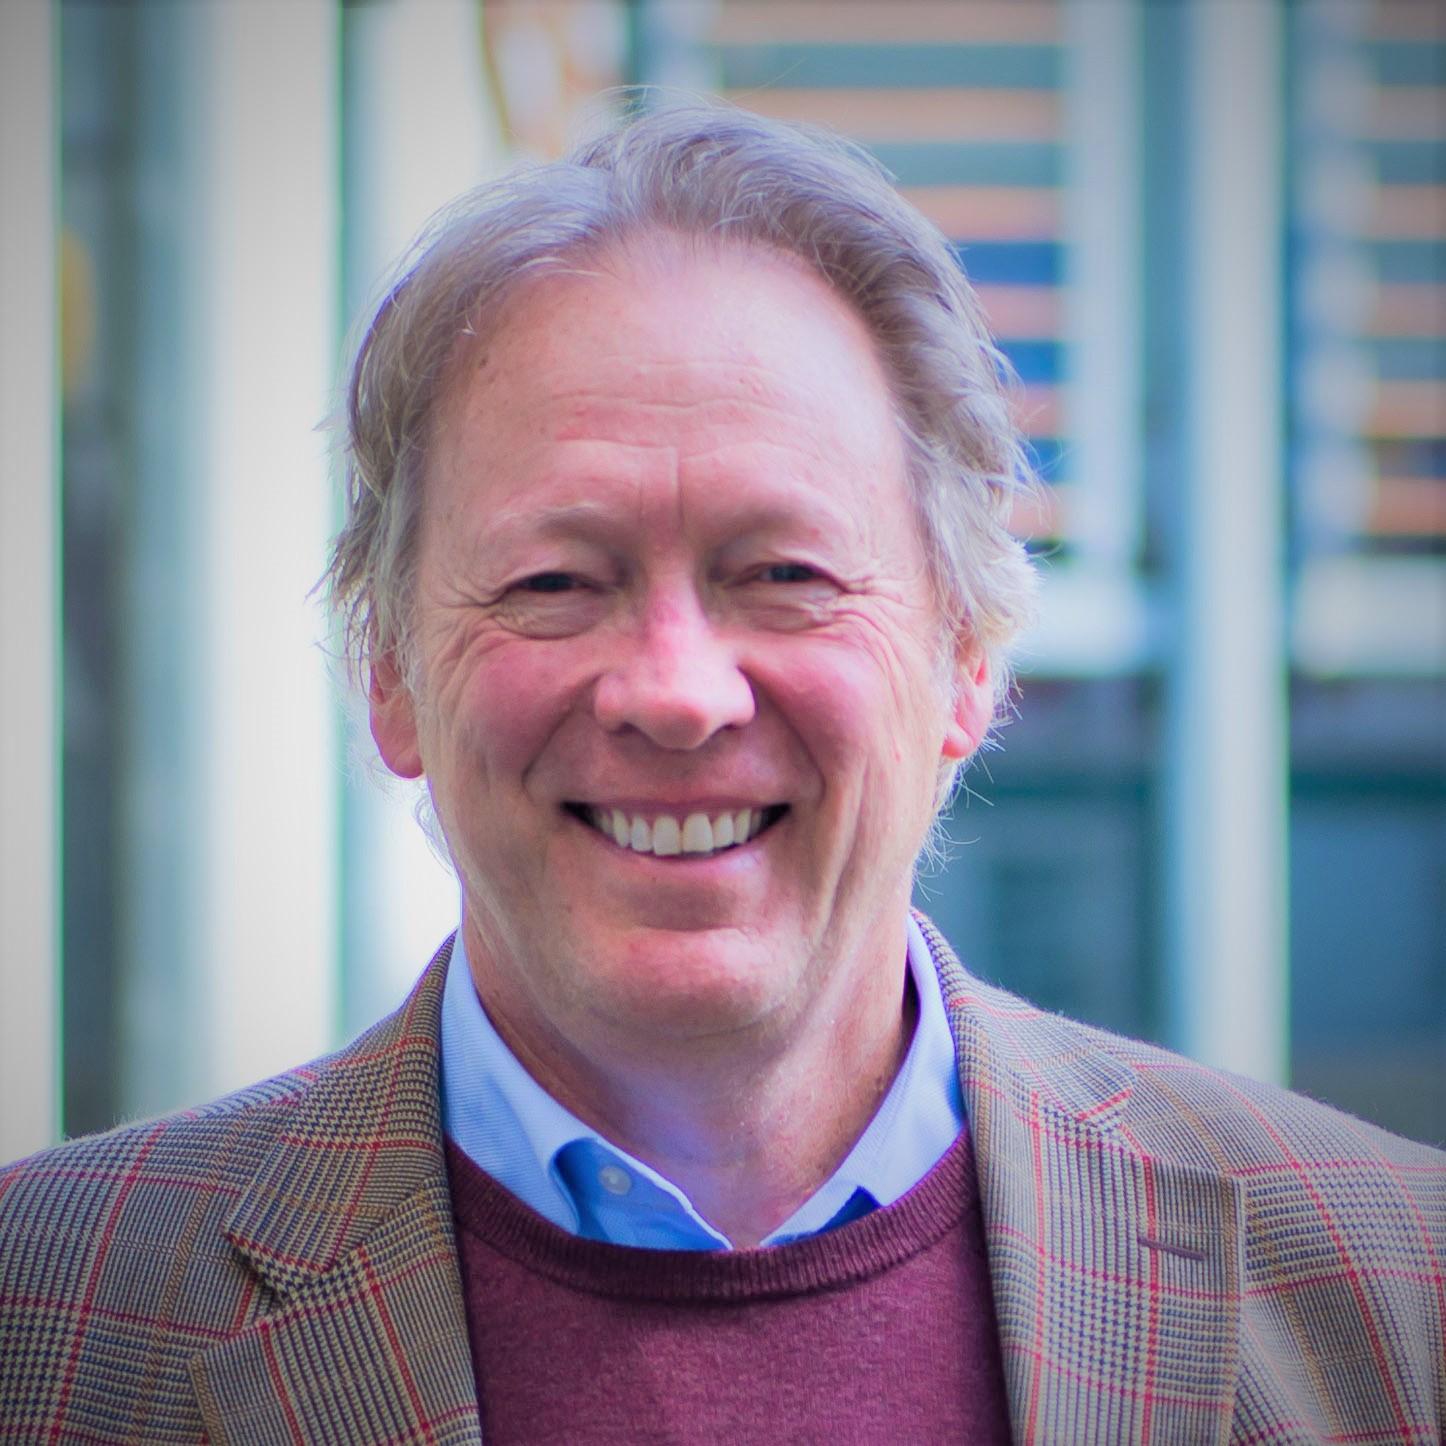 Bill Schmarzo